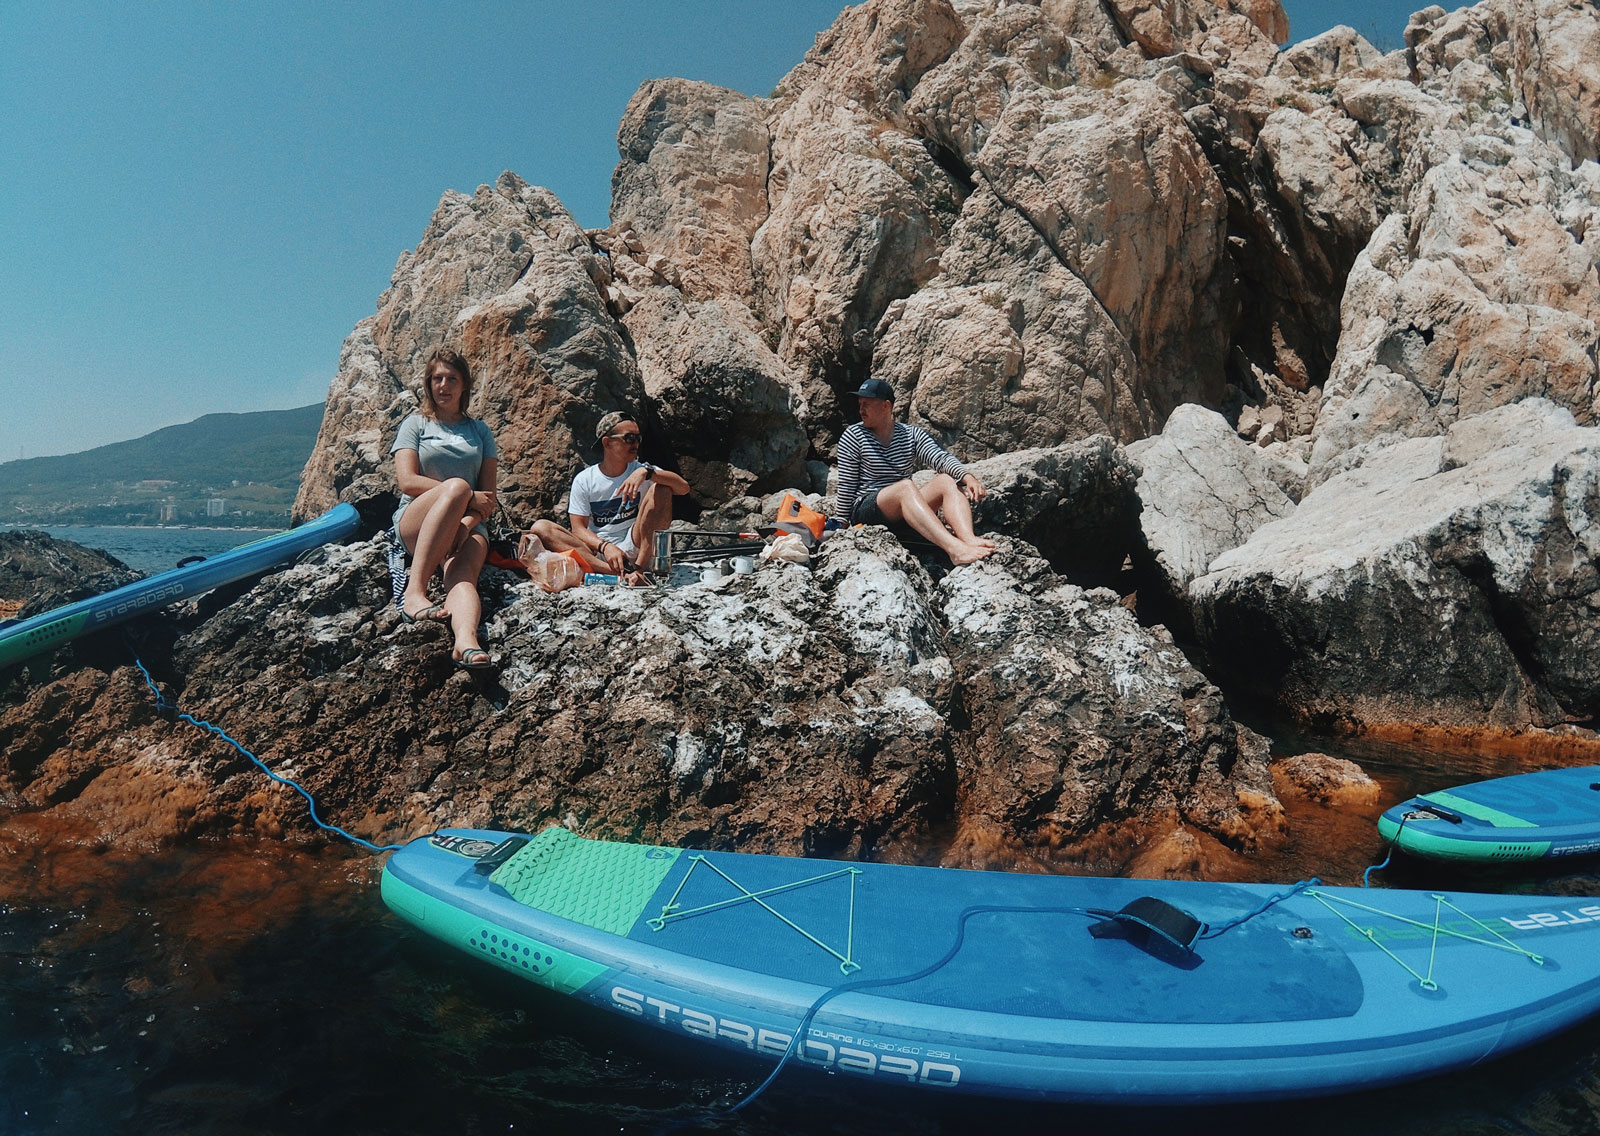 julia-karpacheva-paddleboarding-russia-black-sea-siesta-on-rocks